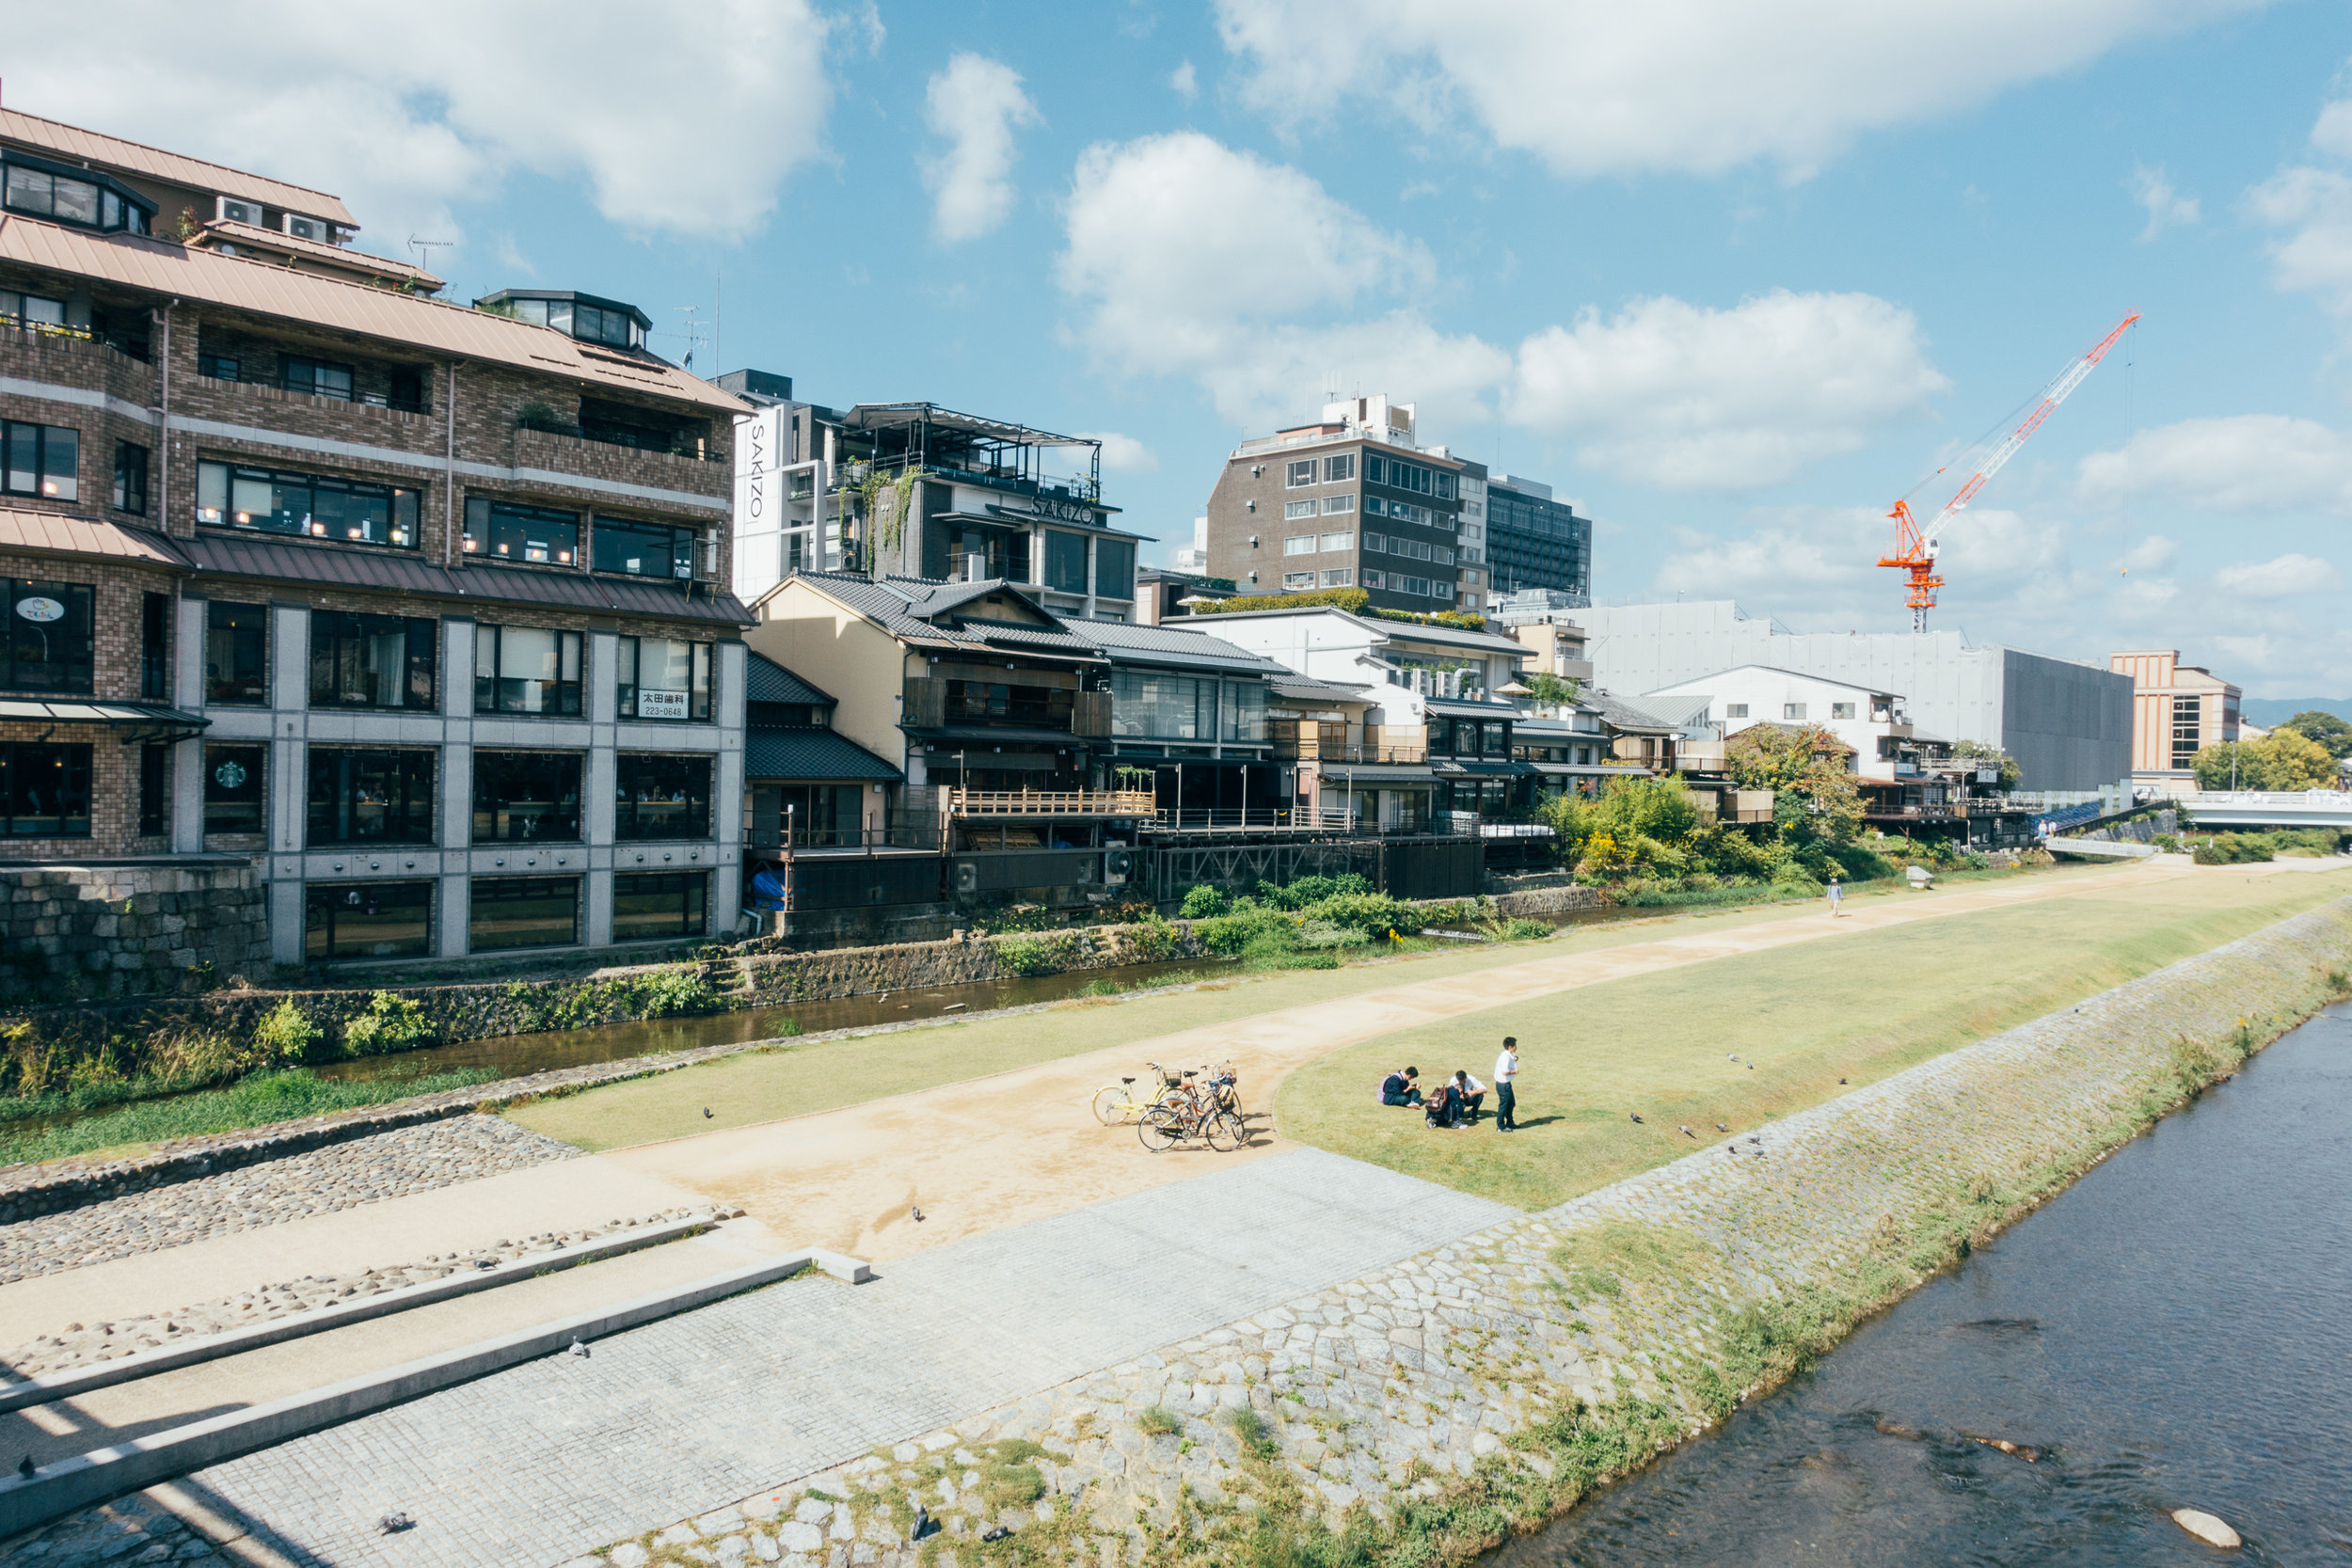 Kamogawa; A river that runs through Kyoto right along the major arteries of the city